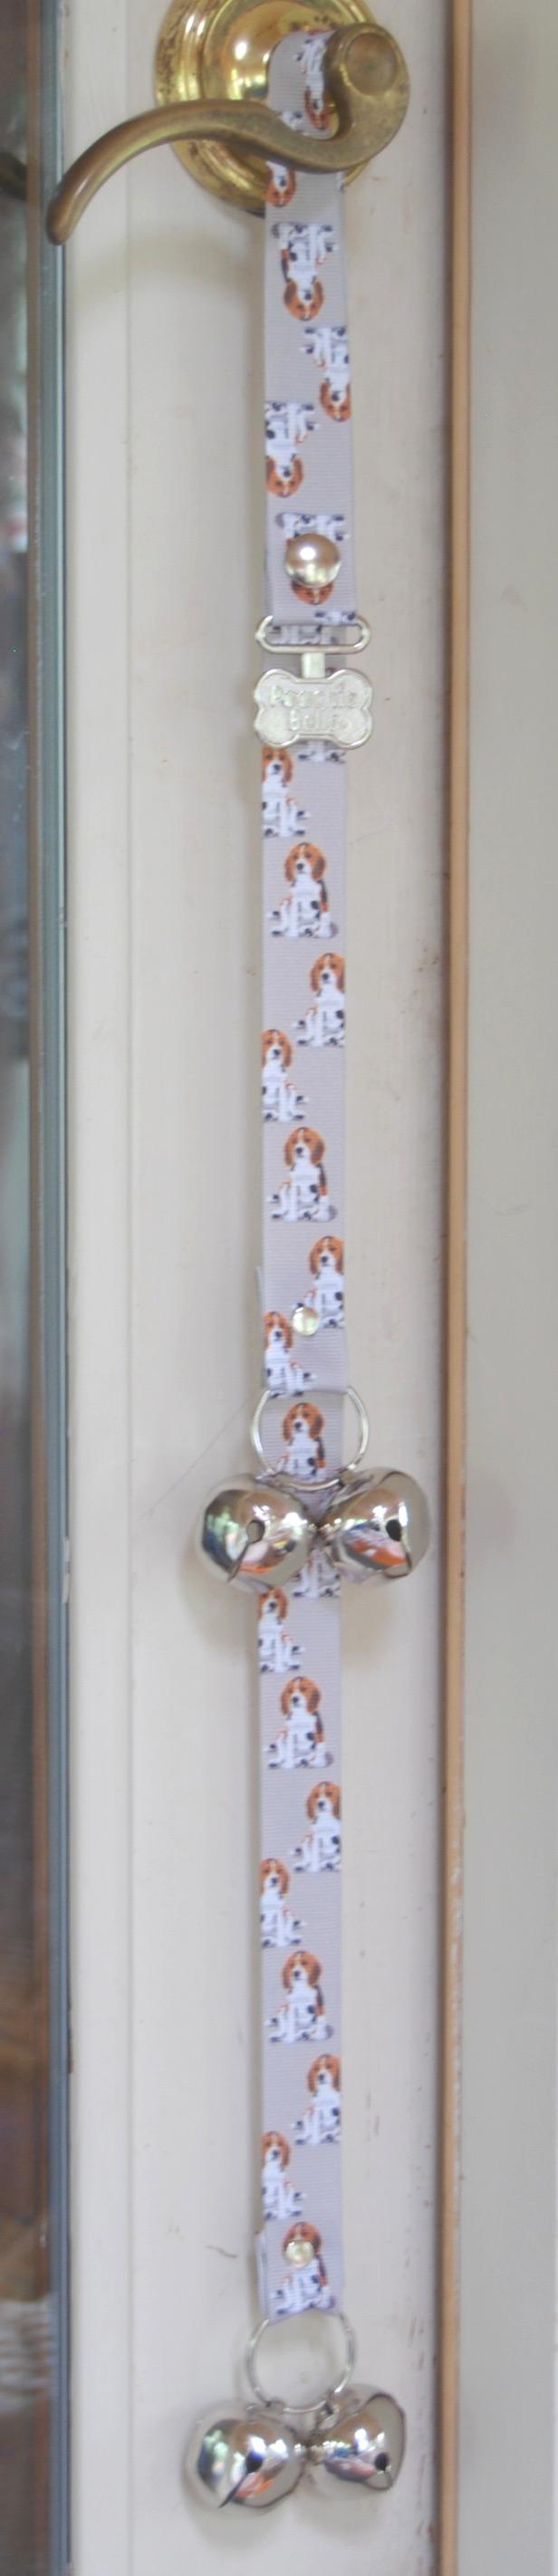 Beagle Puppy Dog Potty Training Doorbells Poochie Bells